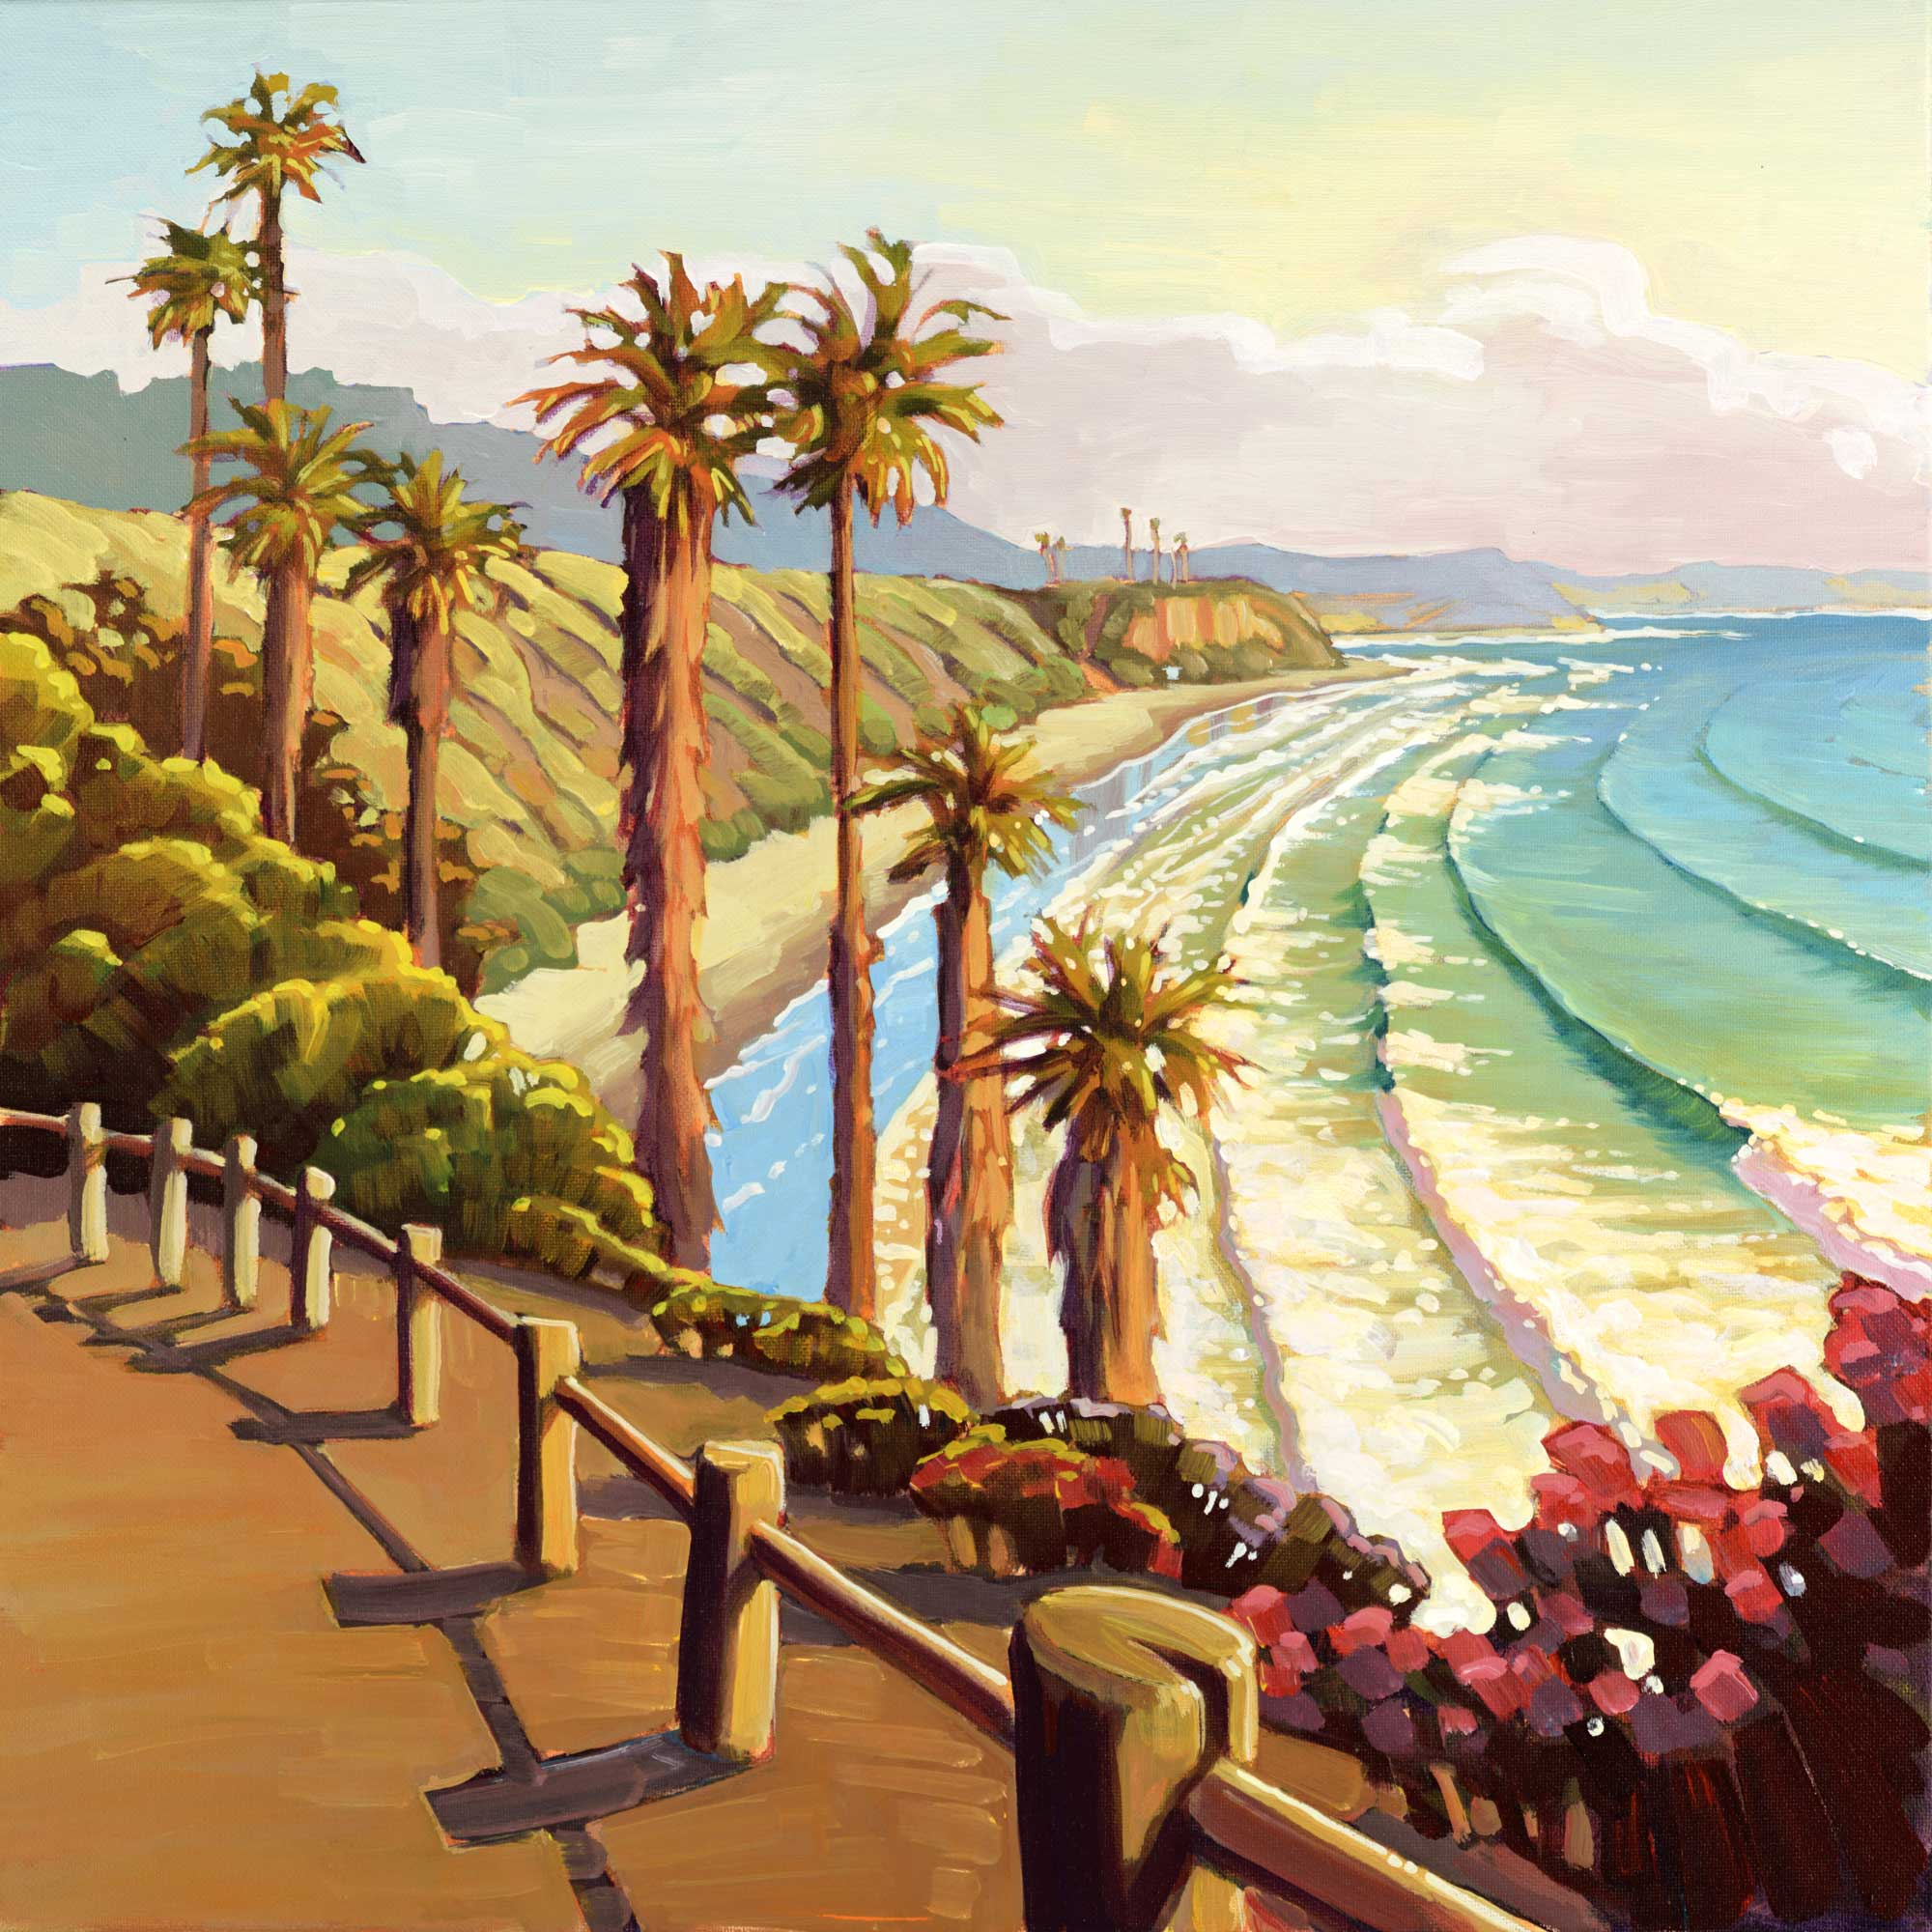 Plein air artwork from the Swami's Beach carpark in Encinitas on the San Diego coast of southern California